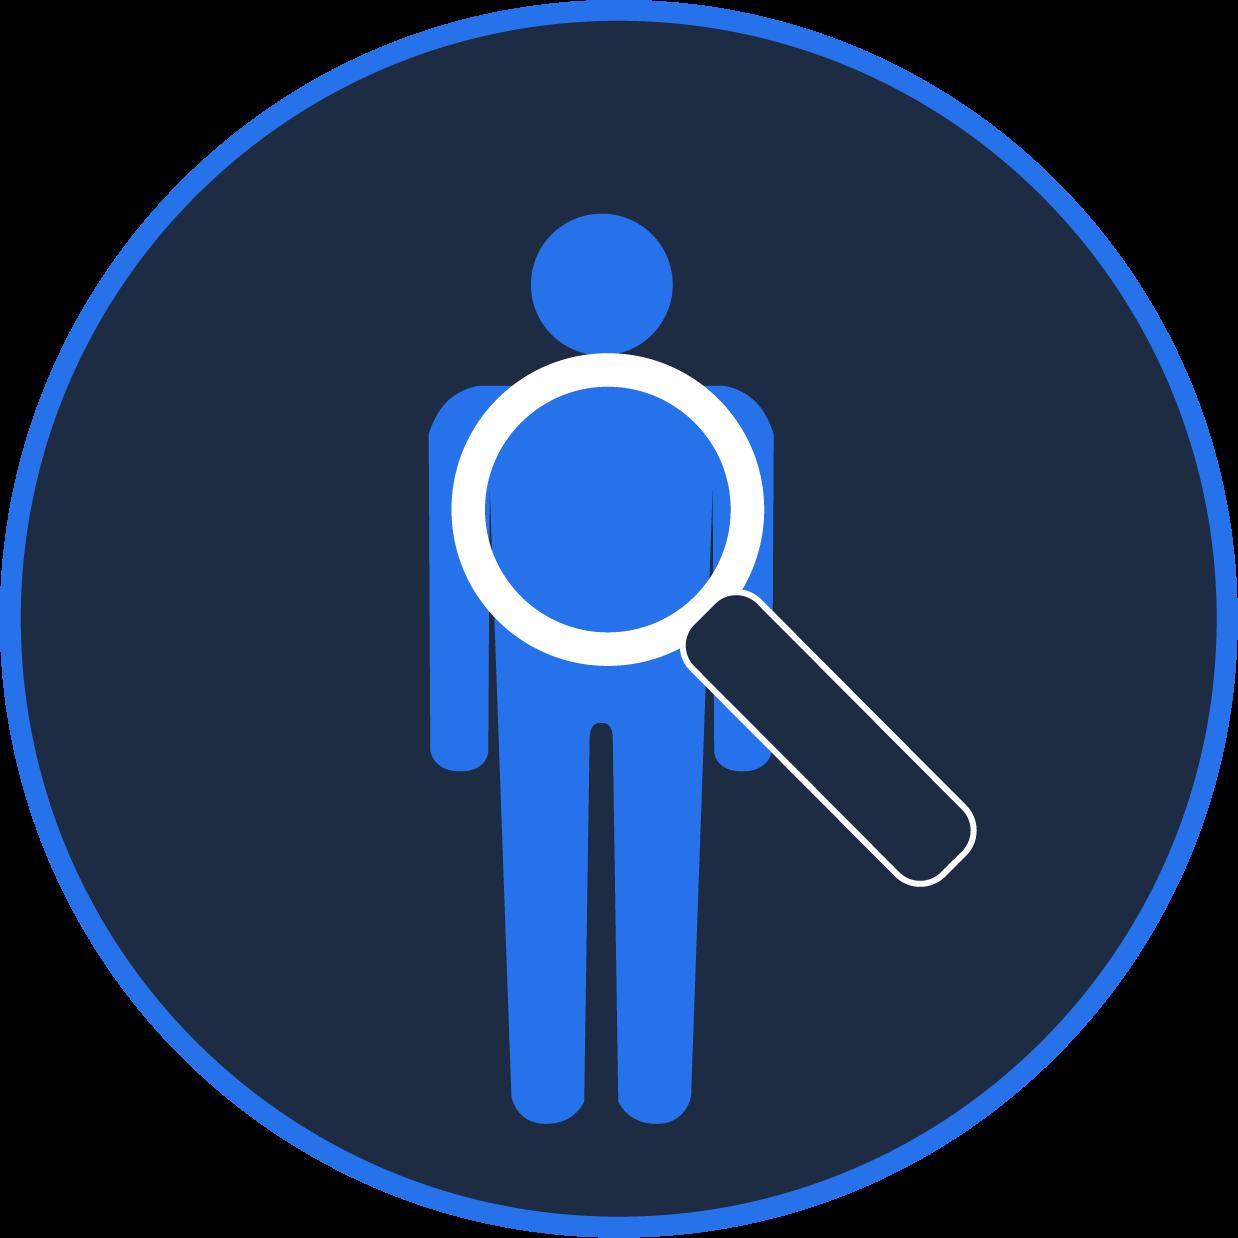 Data protection badge